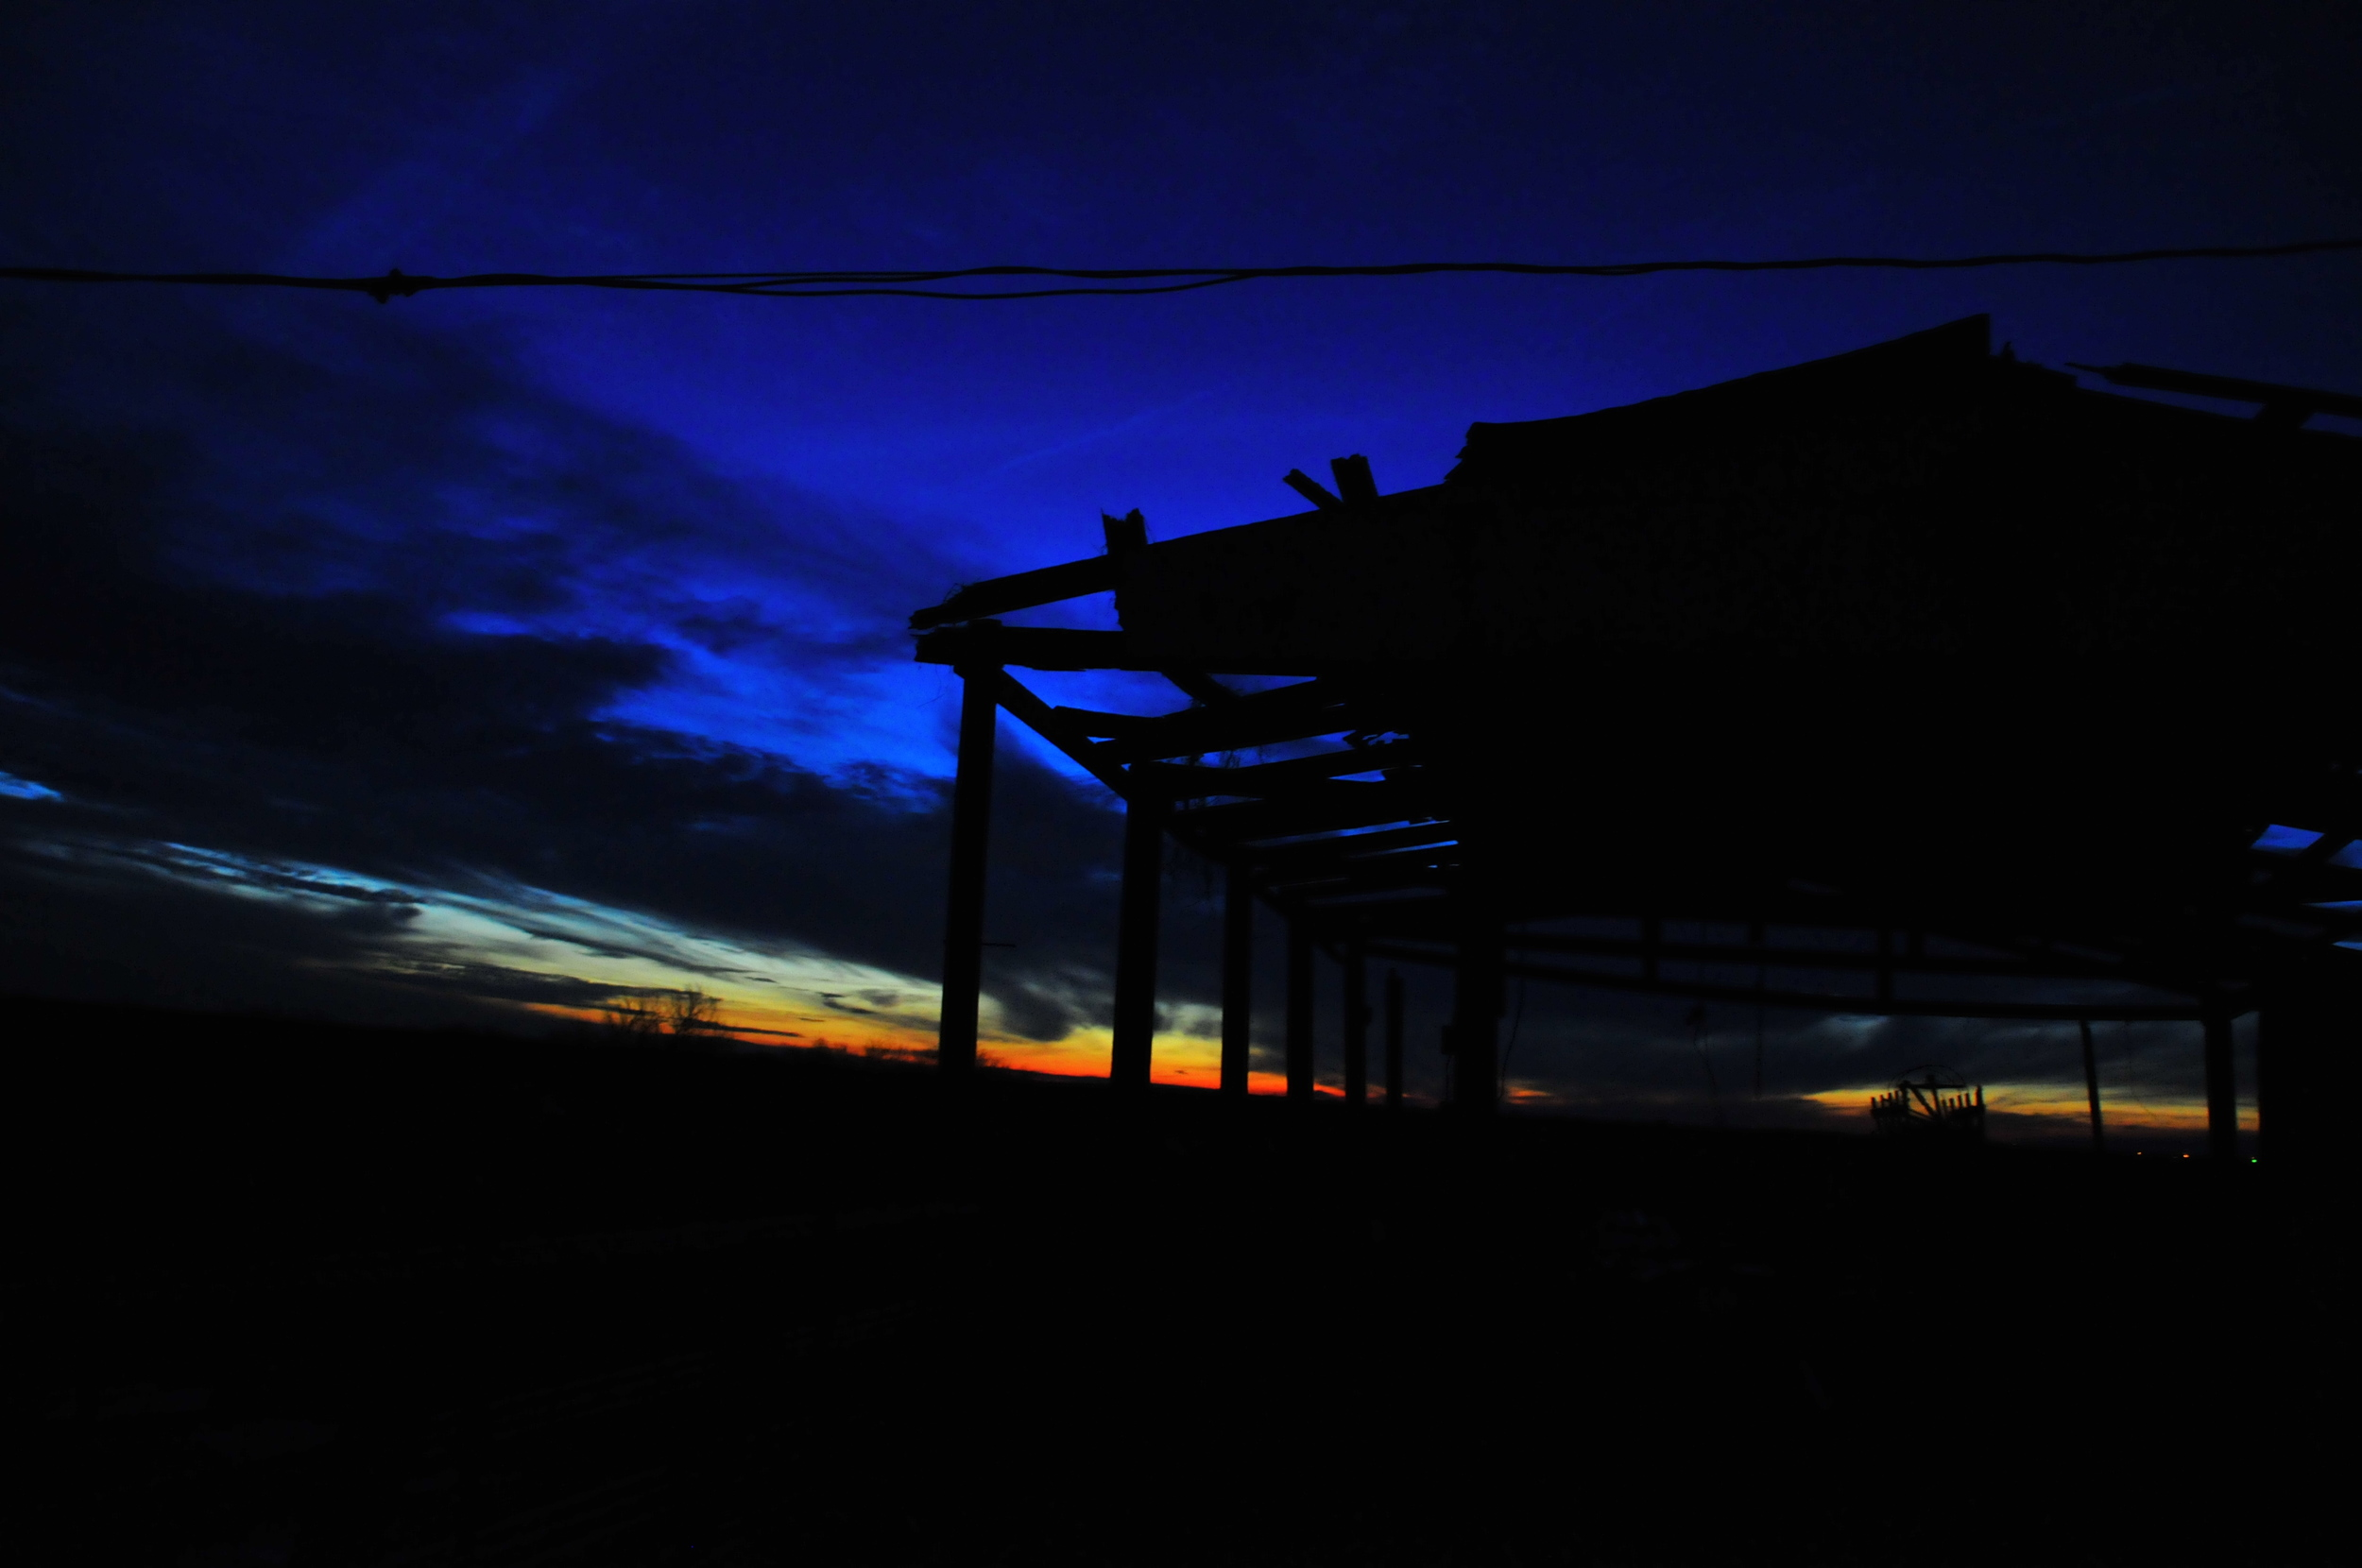 Evening sky in Falfurrias, Texas © David Nittler